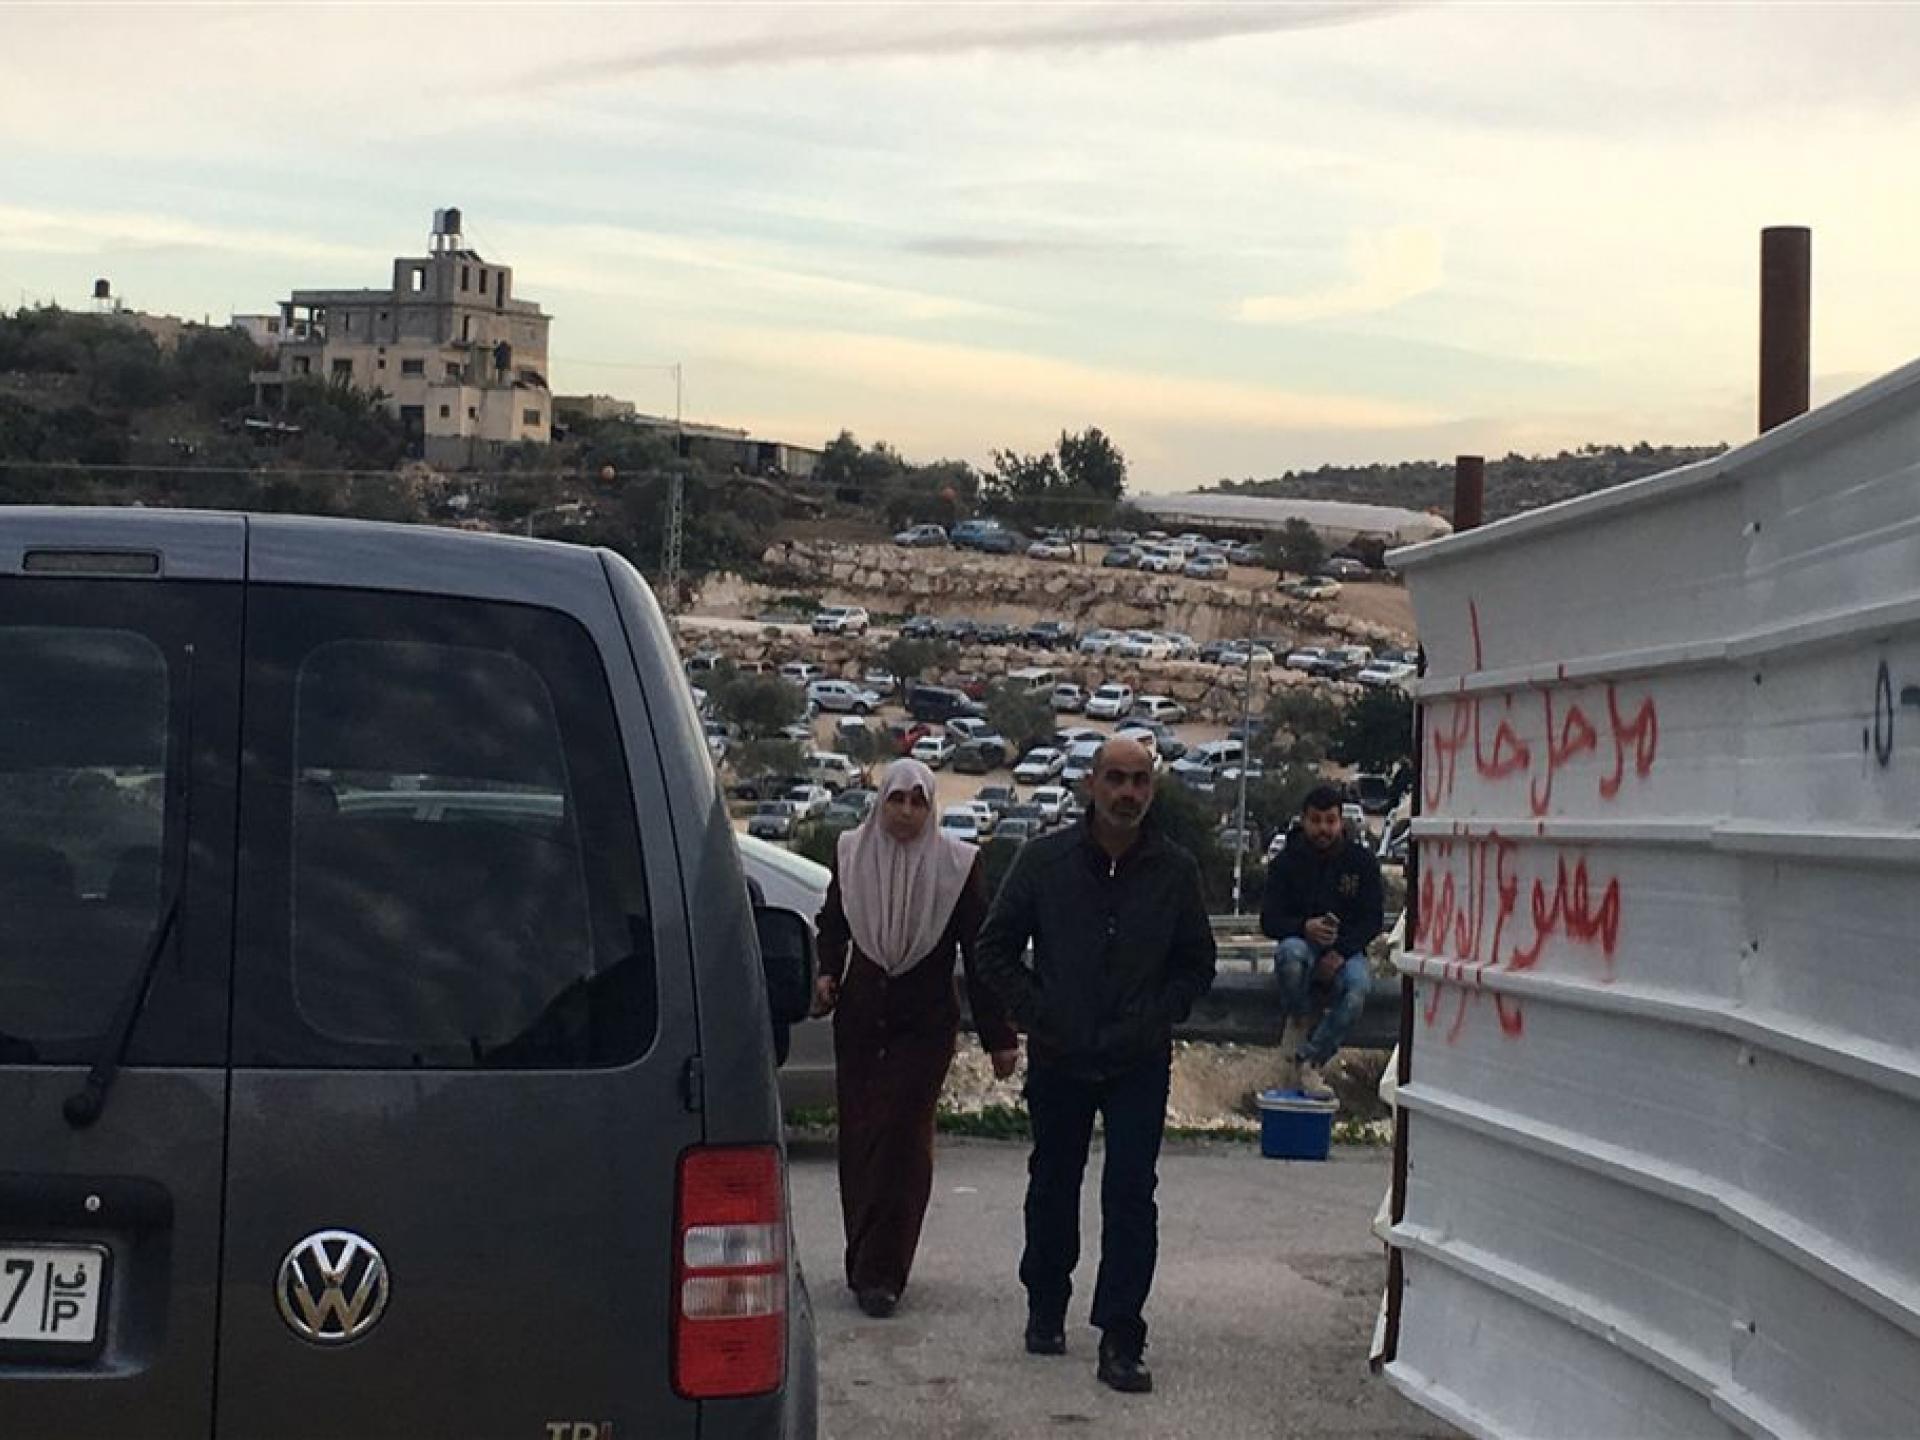 Barta'a checkpoint